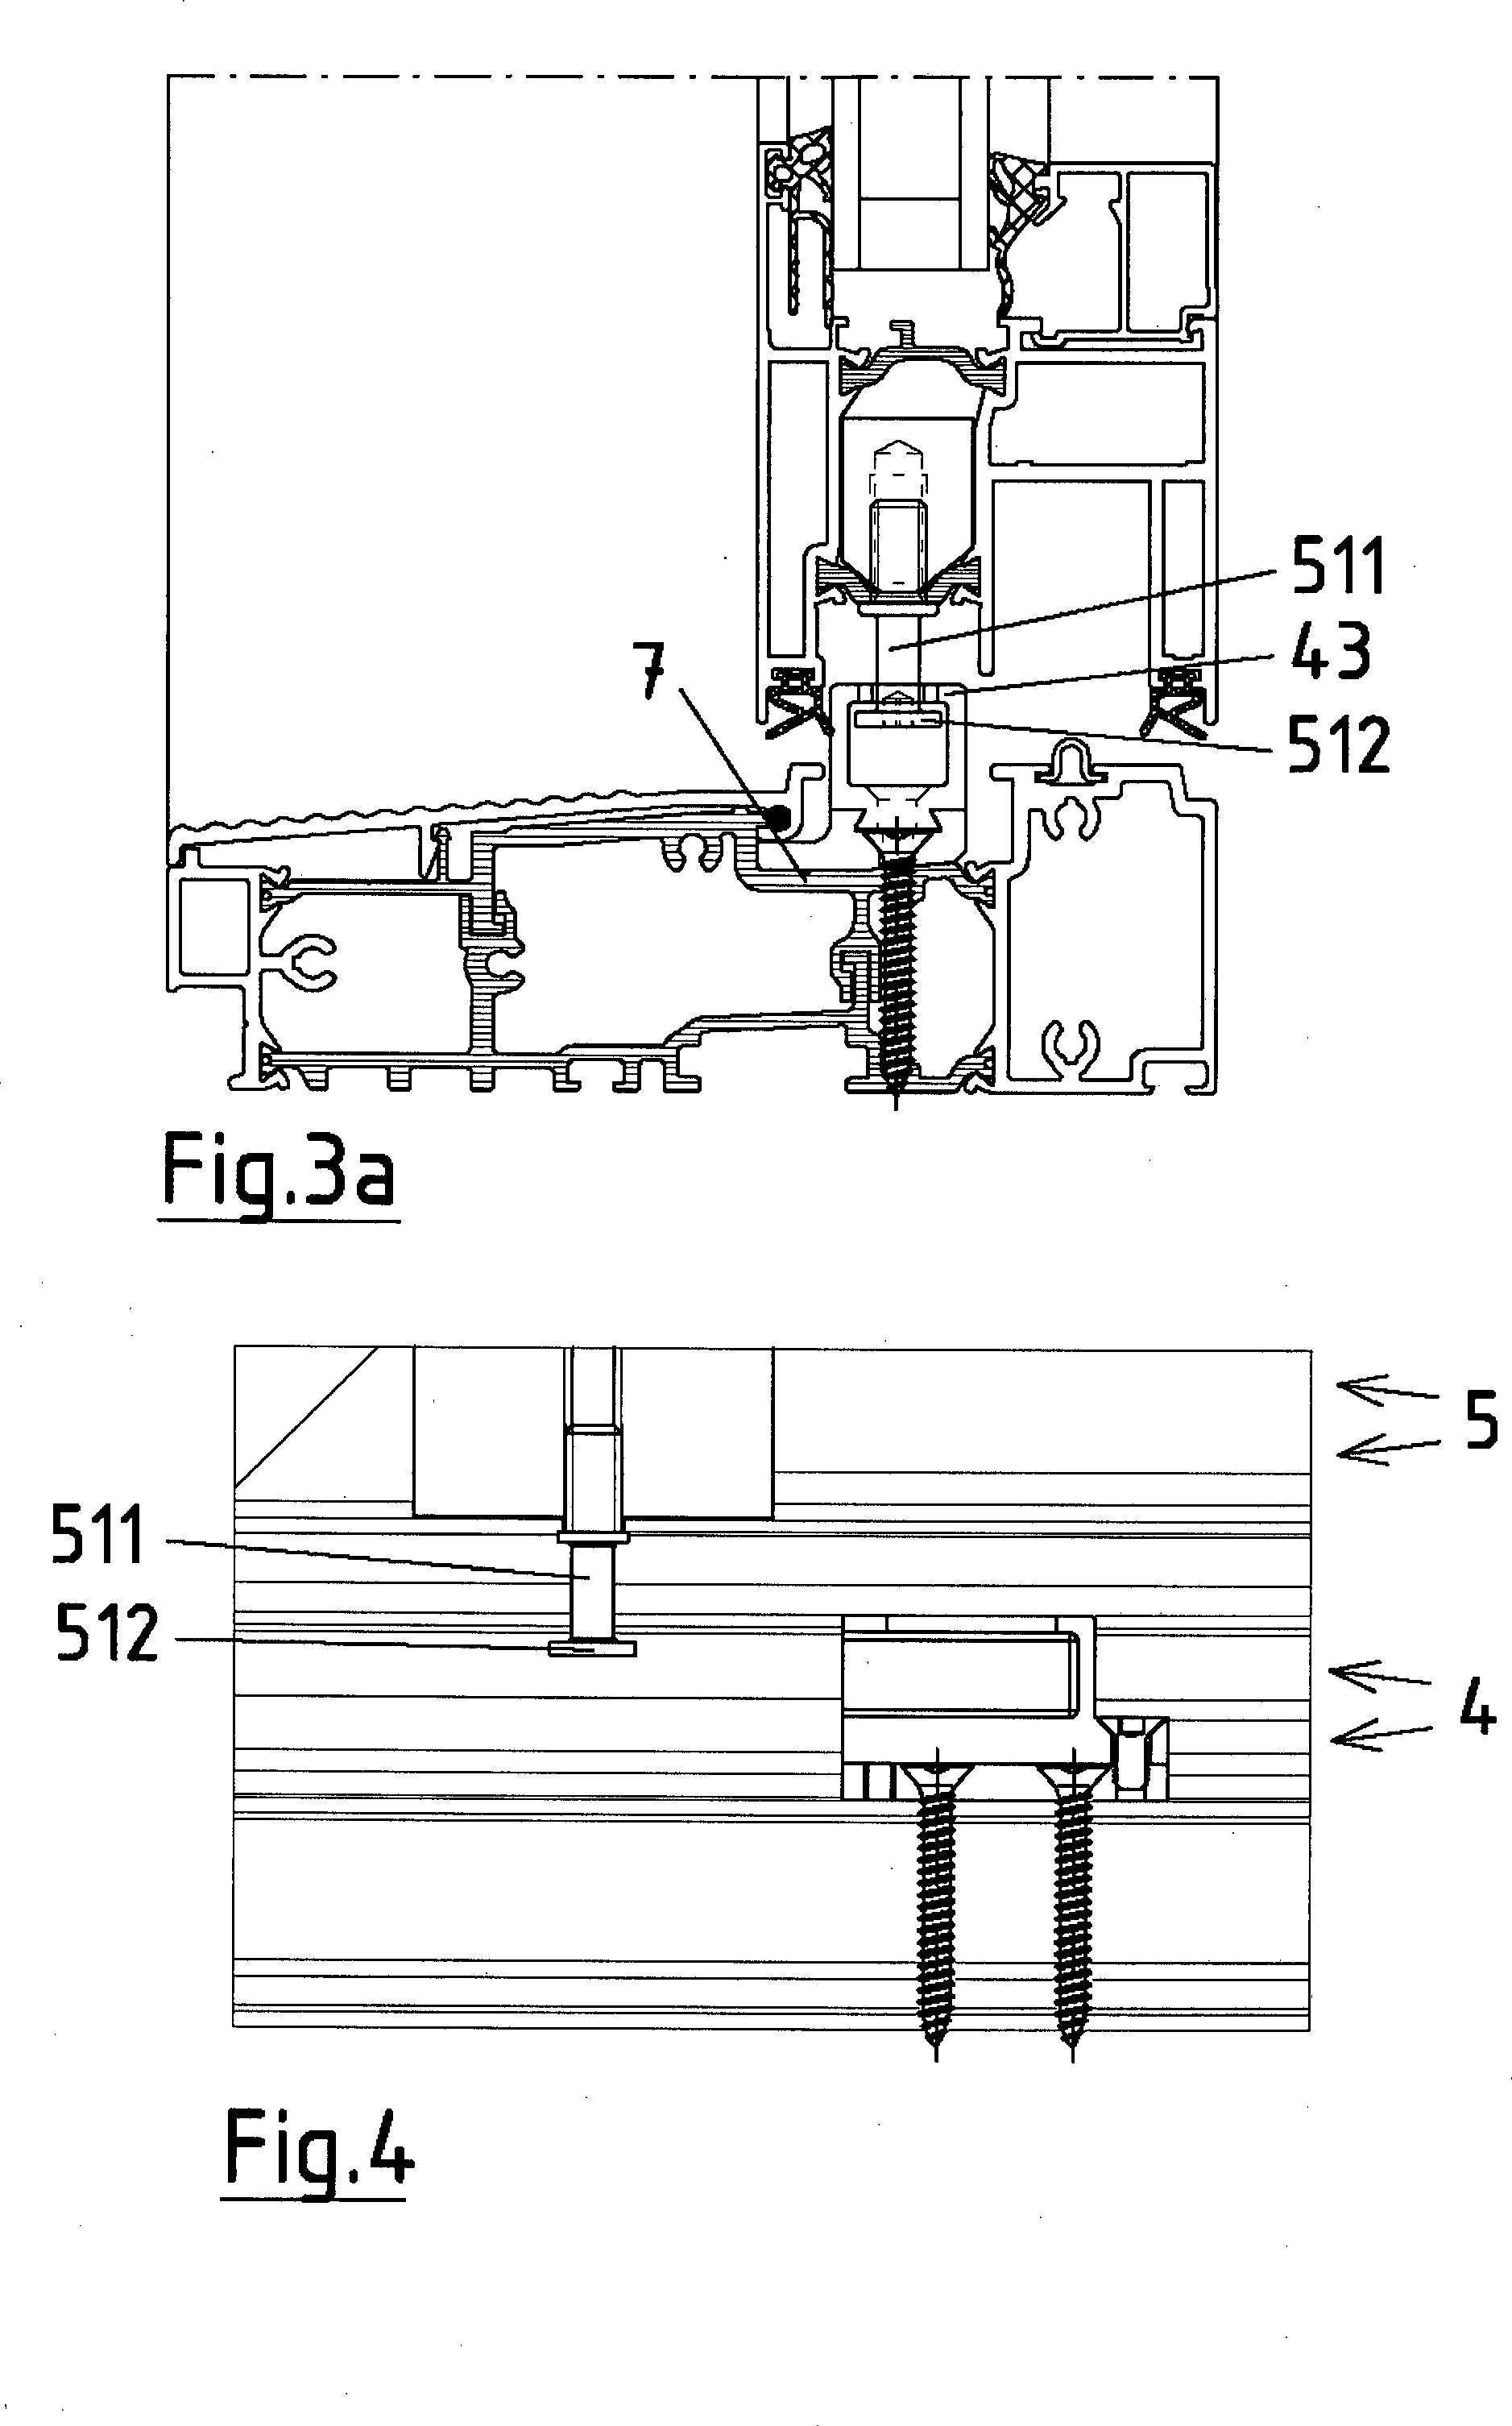 Patent de102011008539a1 hebe schiebe konstruktion for Schiebe fenster